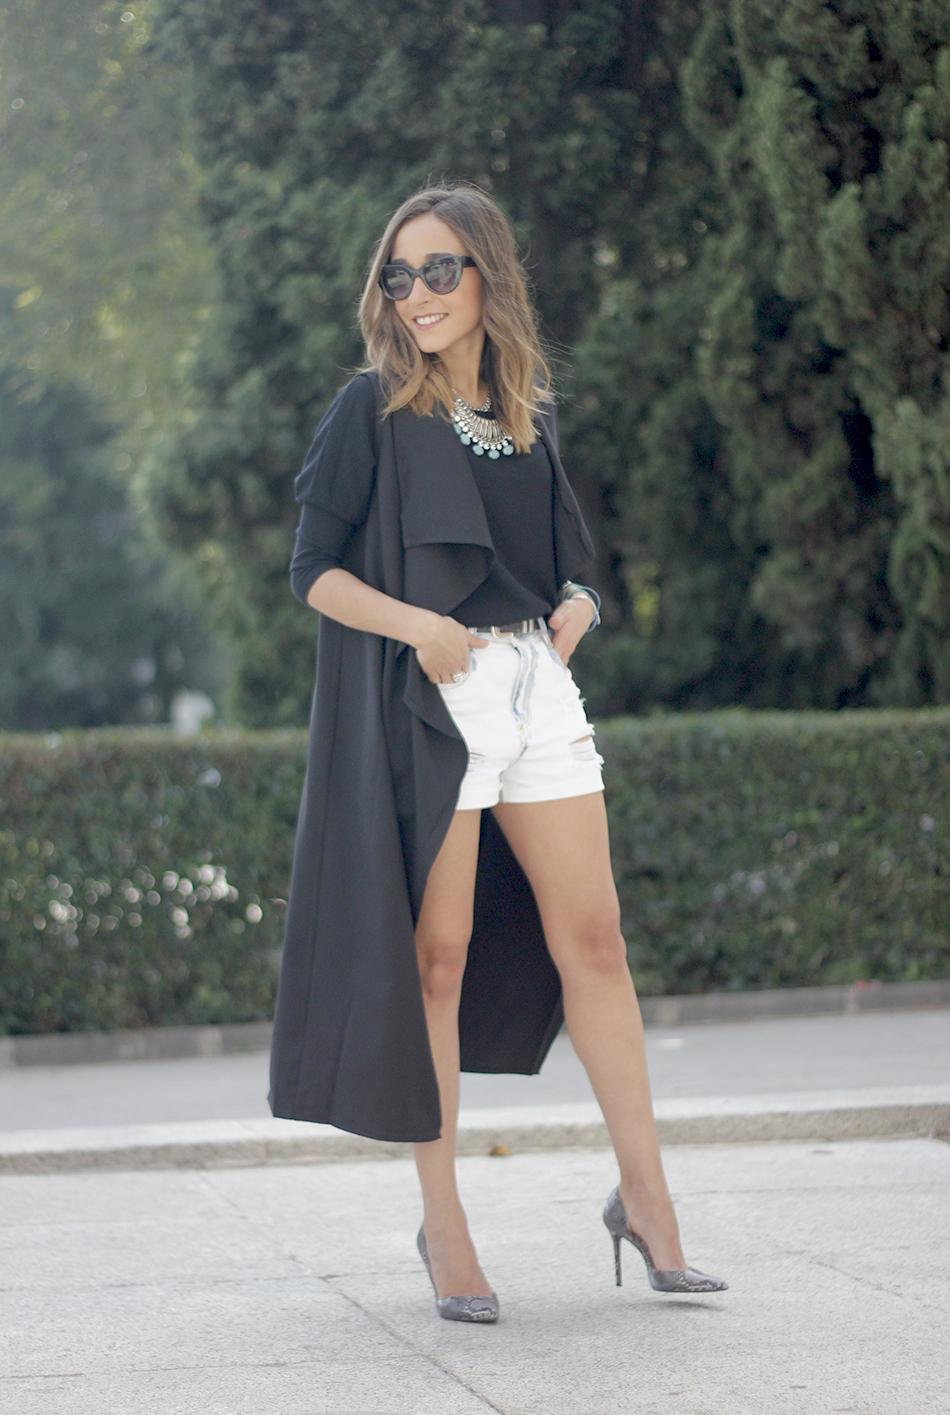 Black Vest Sheinside Shorts Outfit20